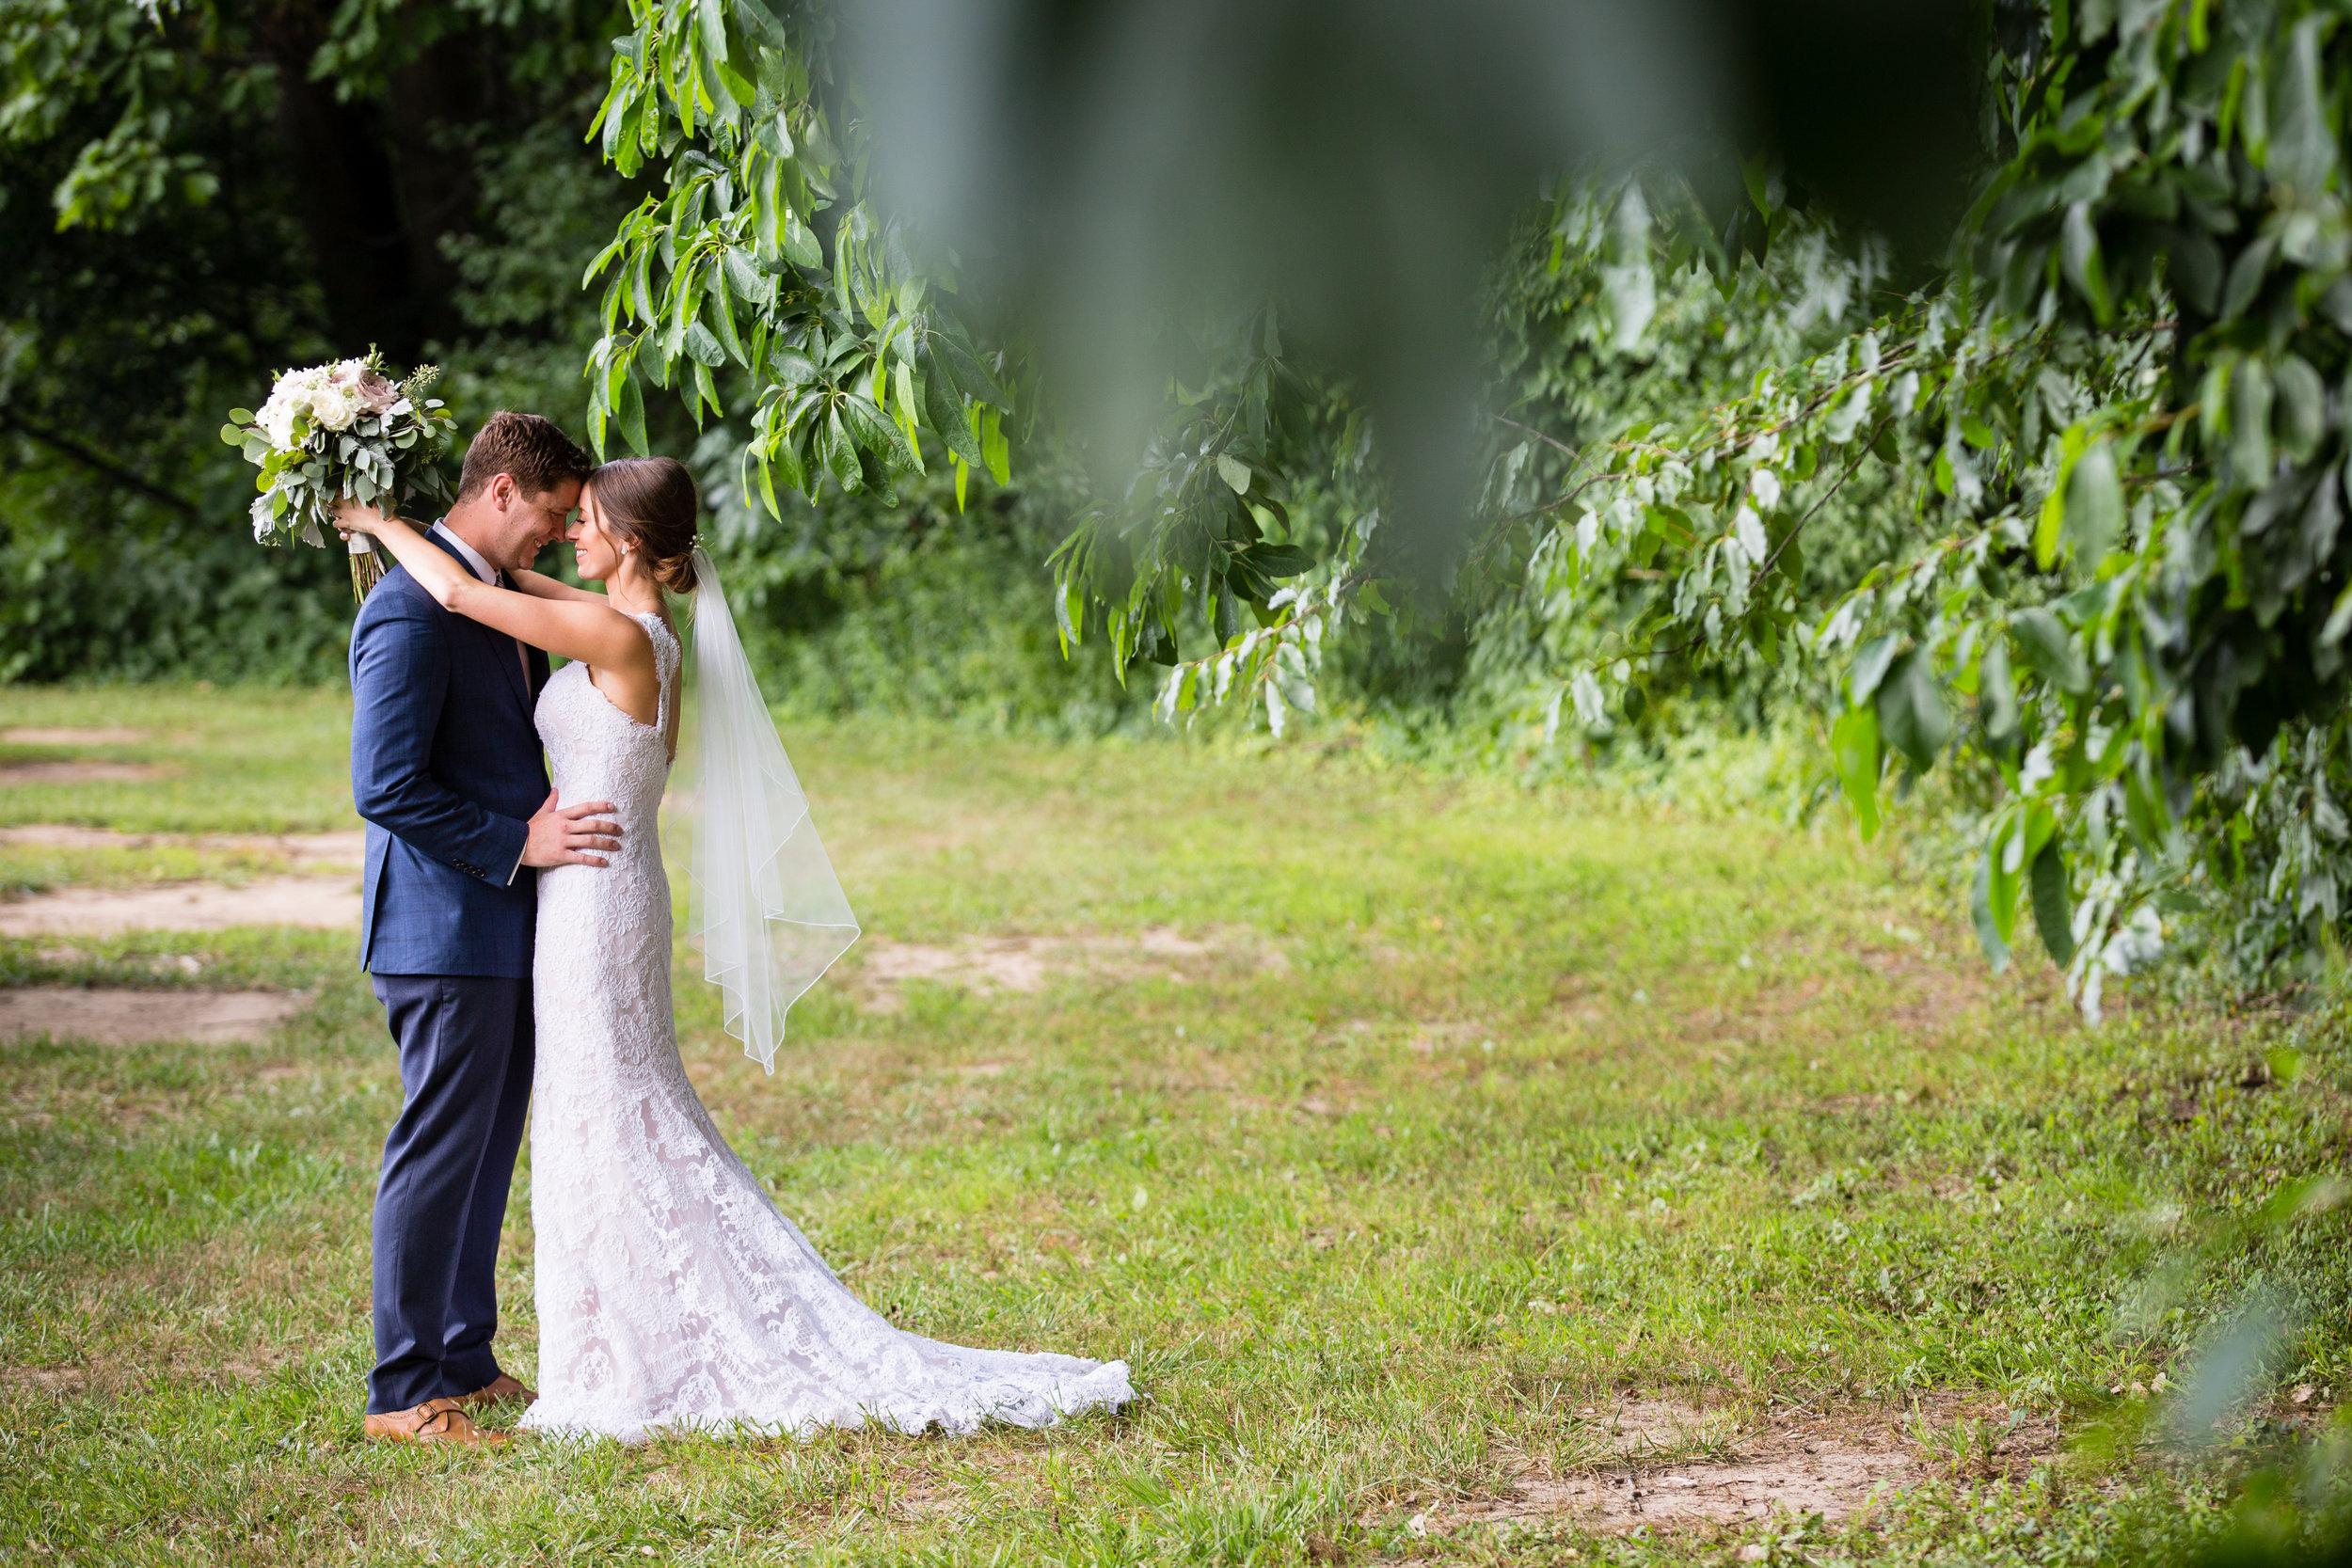 Tim&Polly_Wedding_12CornerVineyard_blog049.JPG